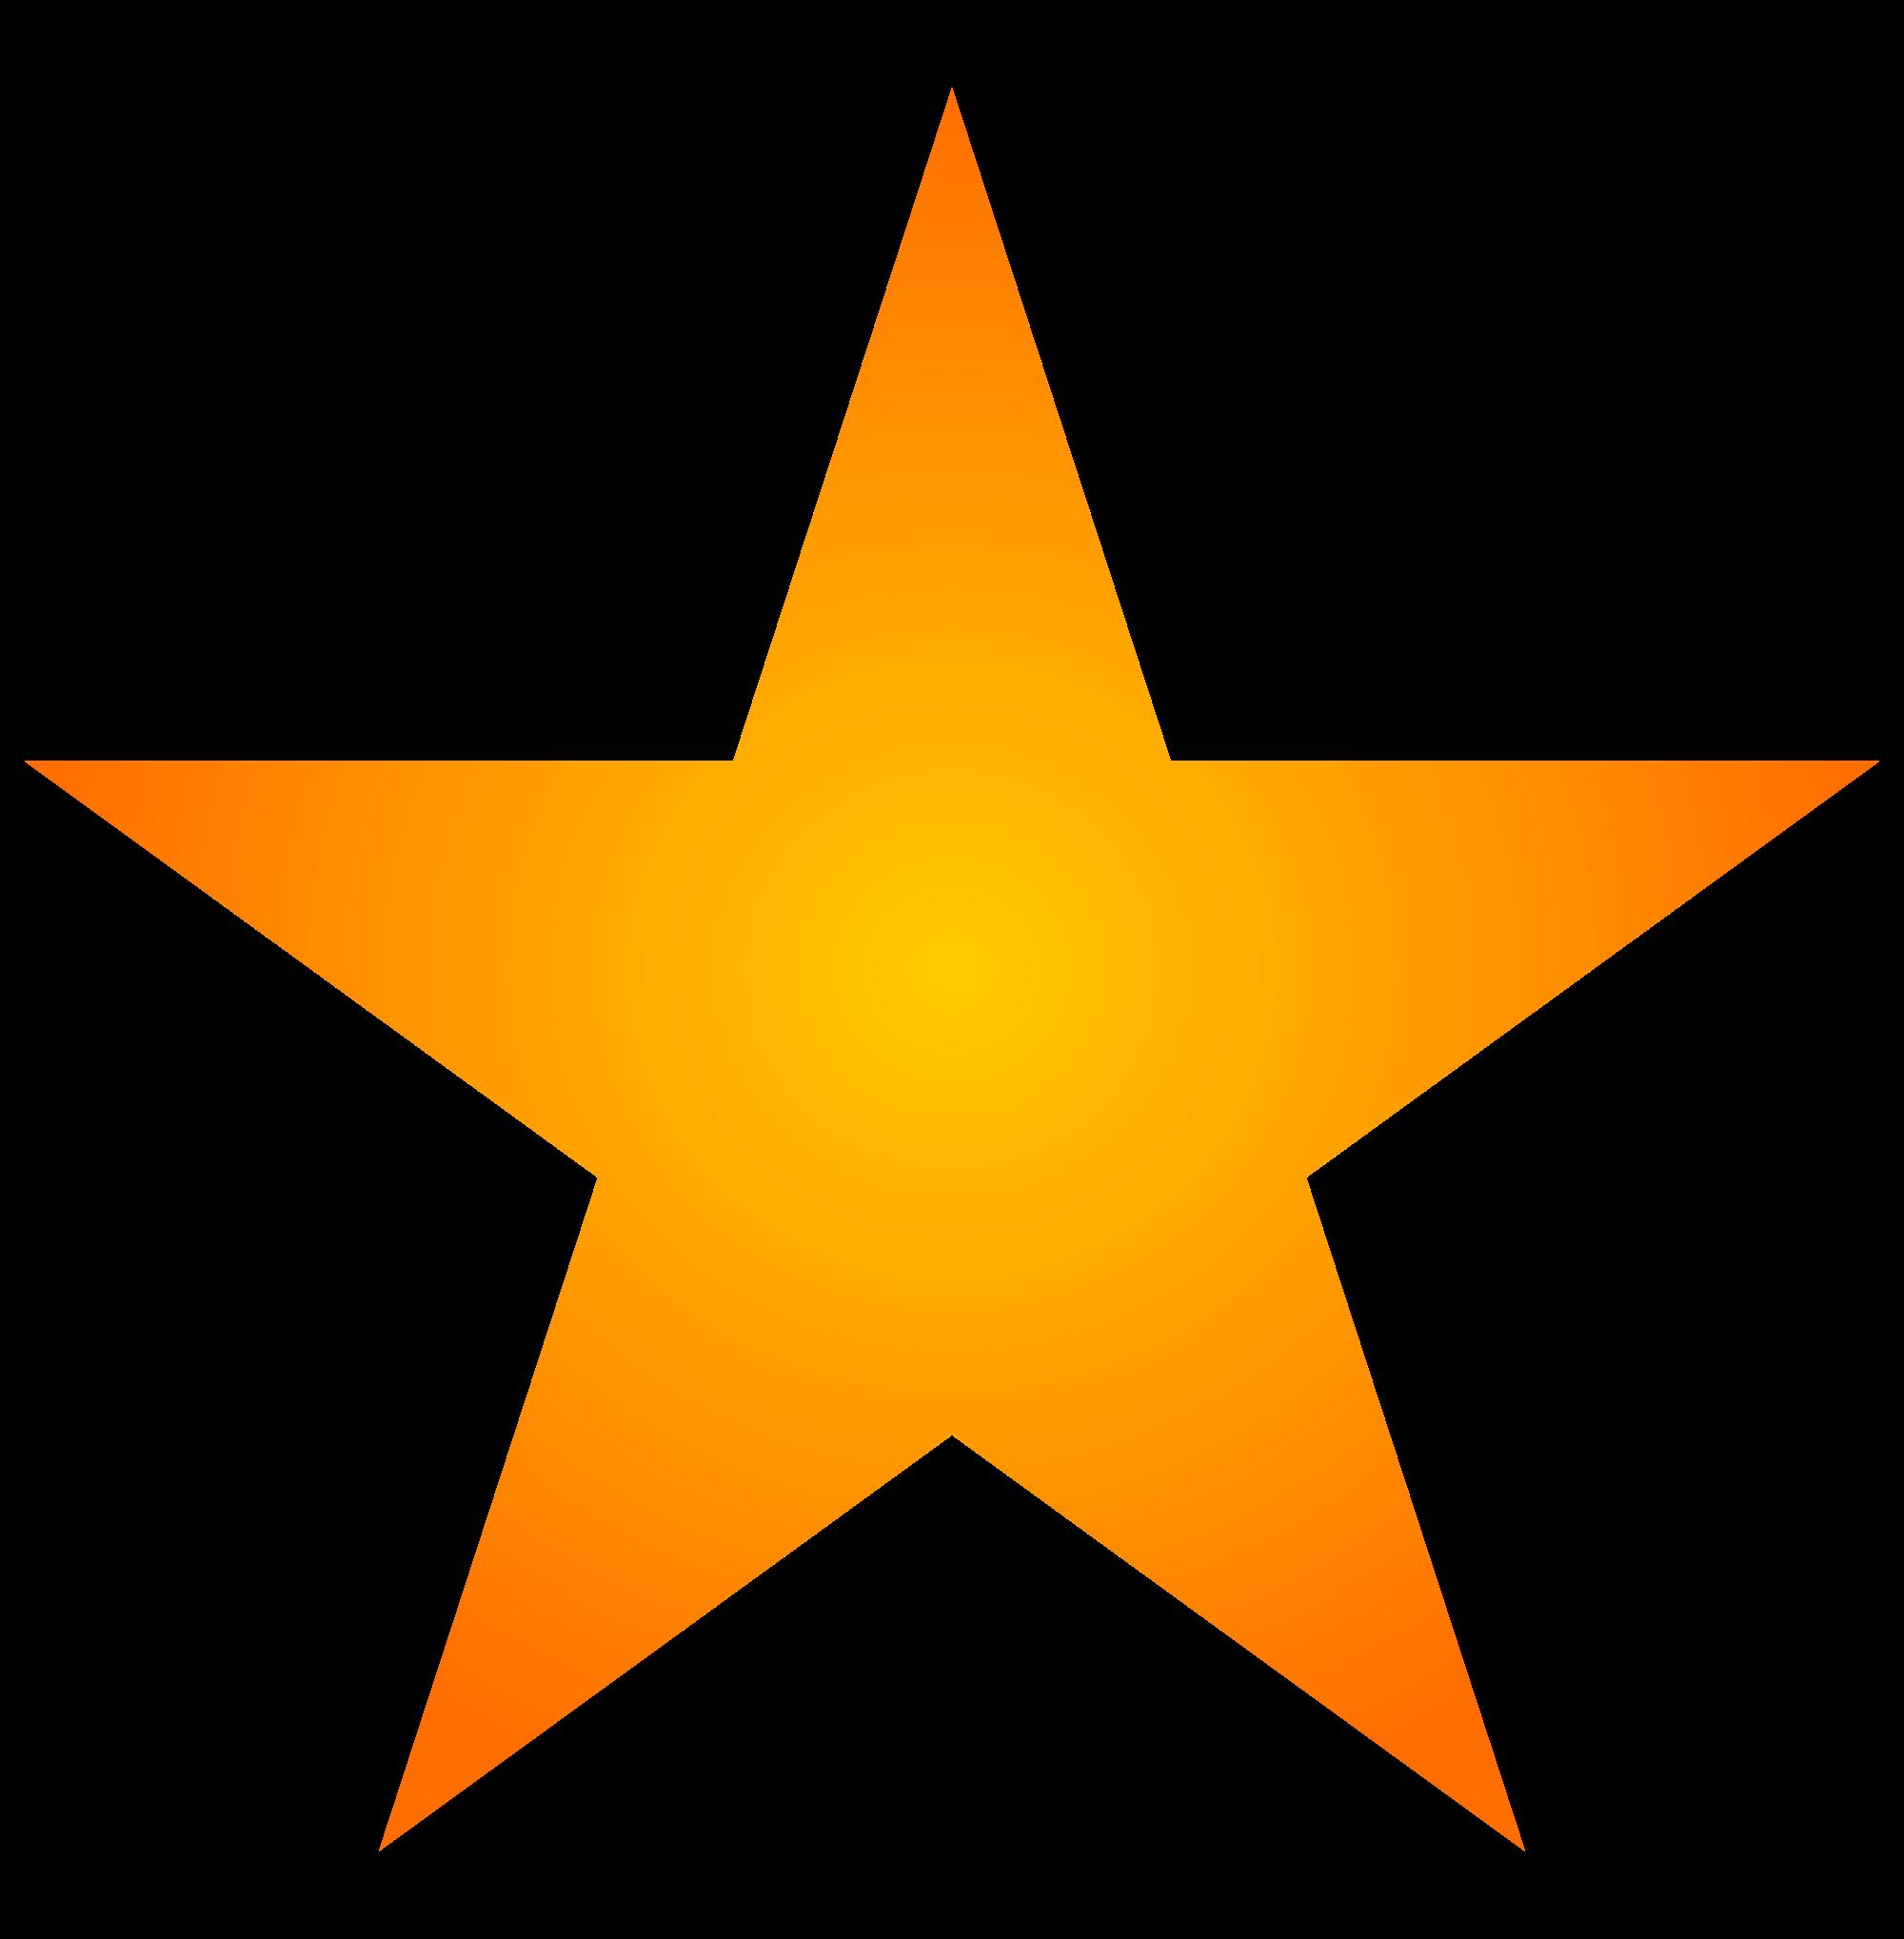 Star reward clipart clip transparent library Star Image Group (53+) clip transparent library